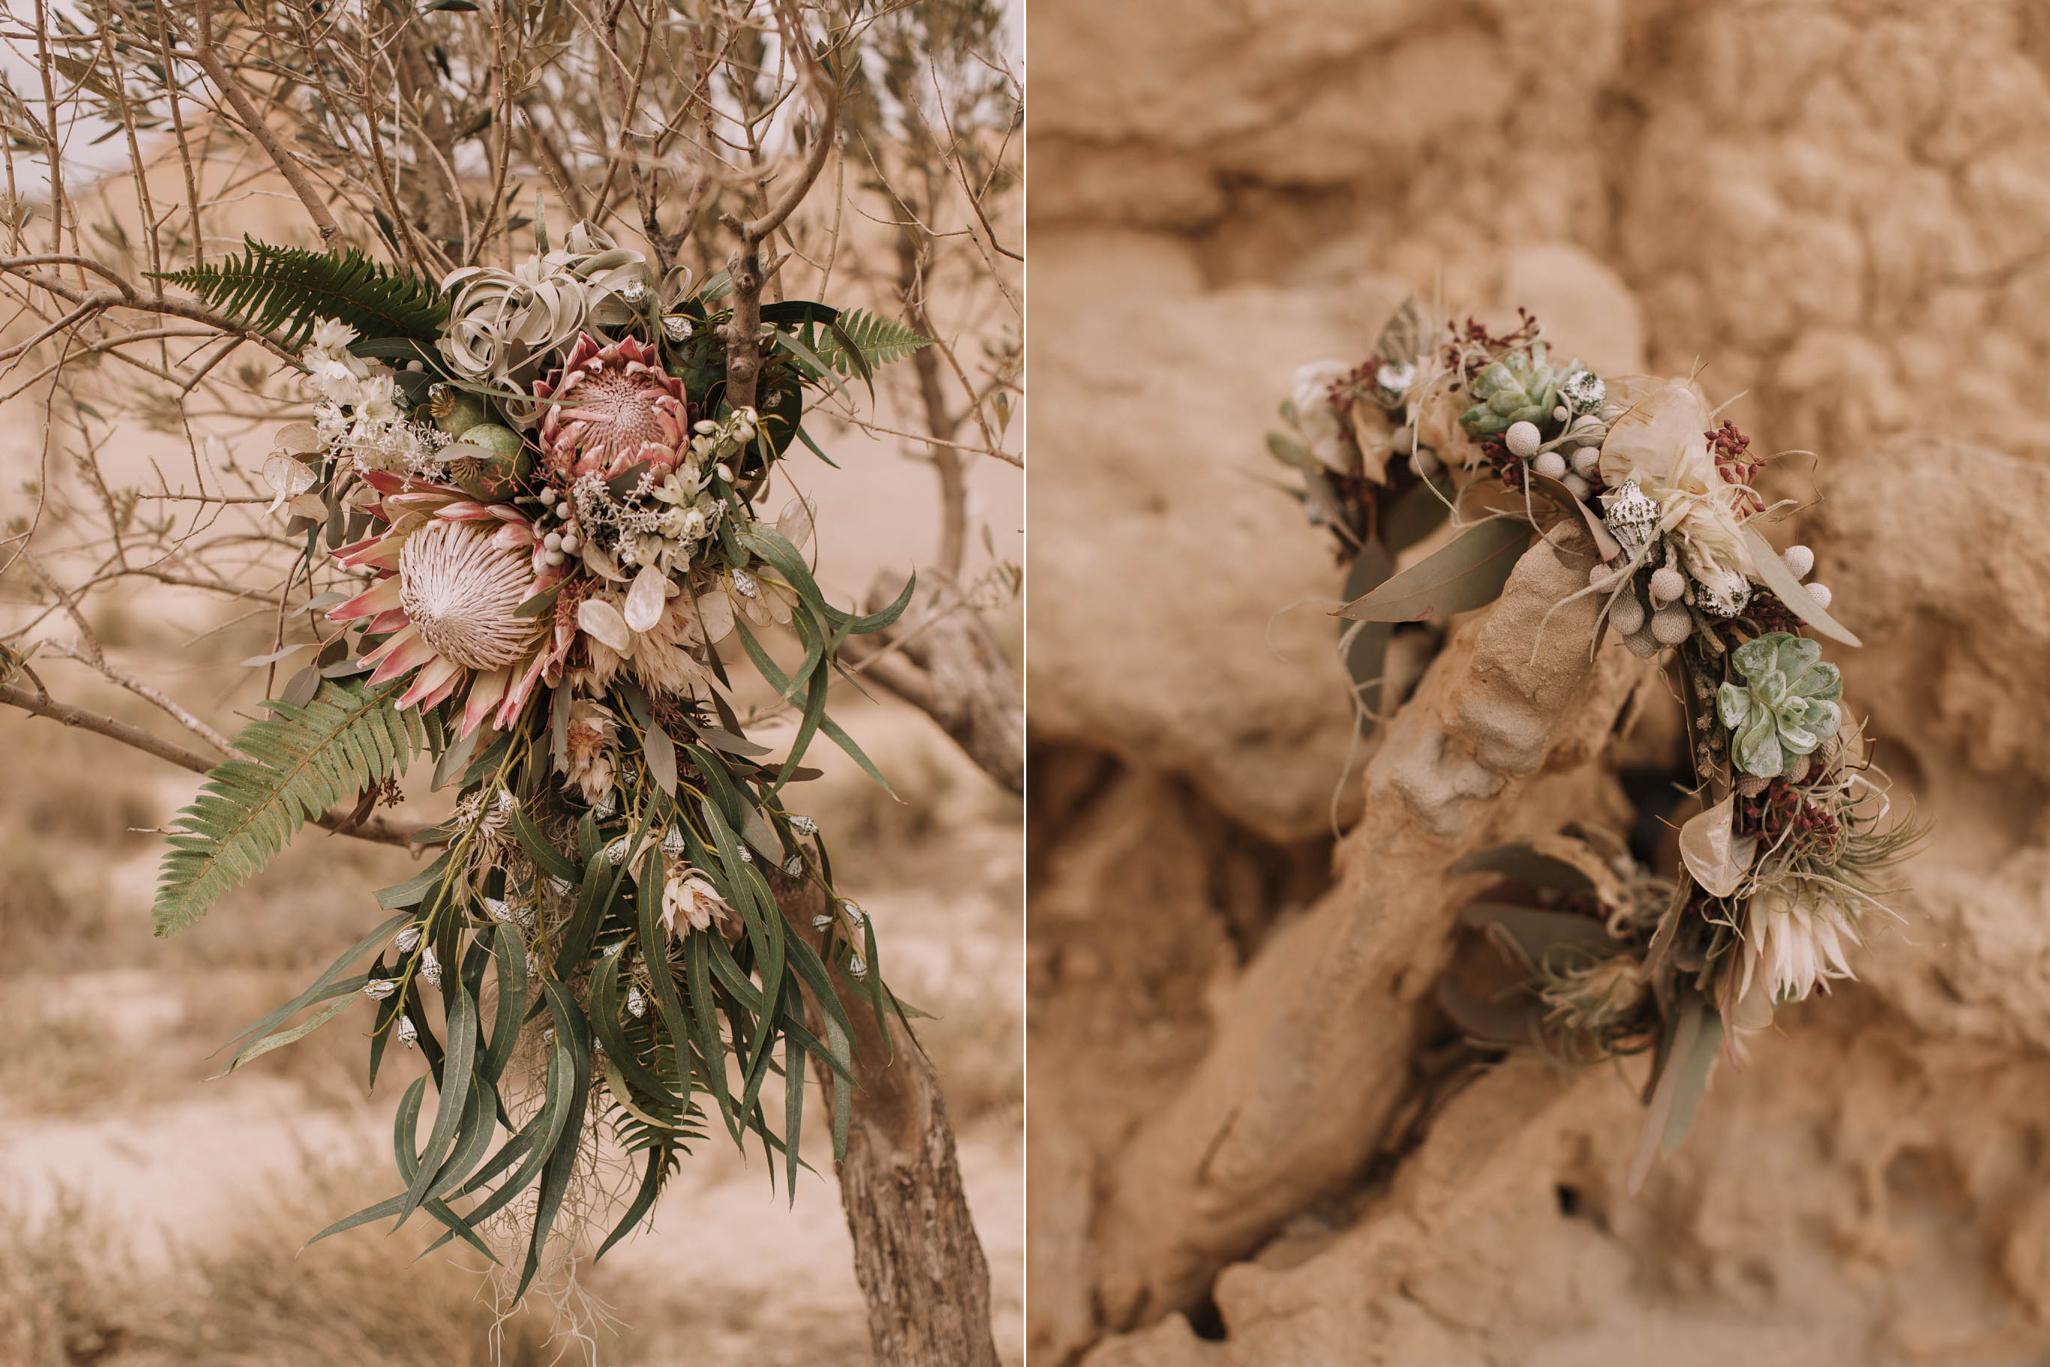 Spain-wedding-photographer-bardenas-reales-jeremy-boyer-photographe-mariage-bordeaux-floral-wedding-dress-robe-36.jpg